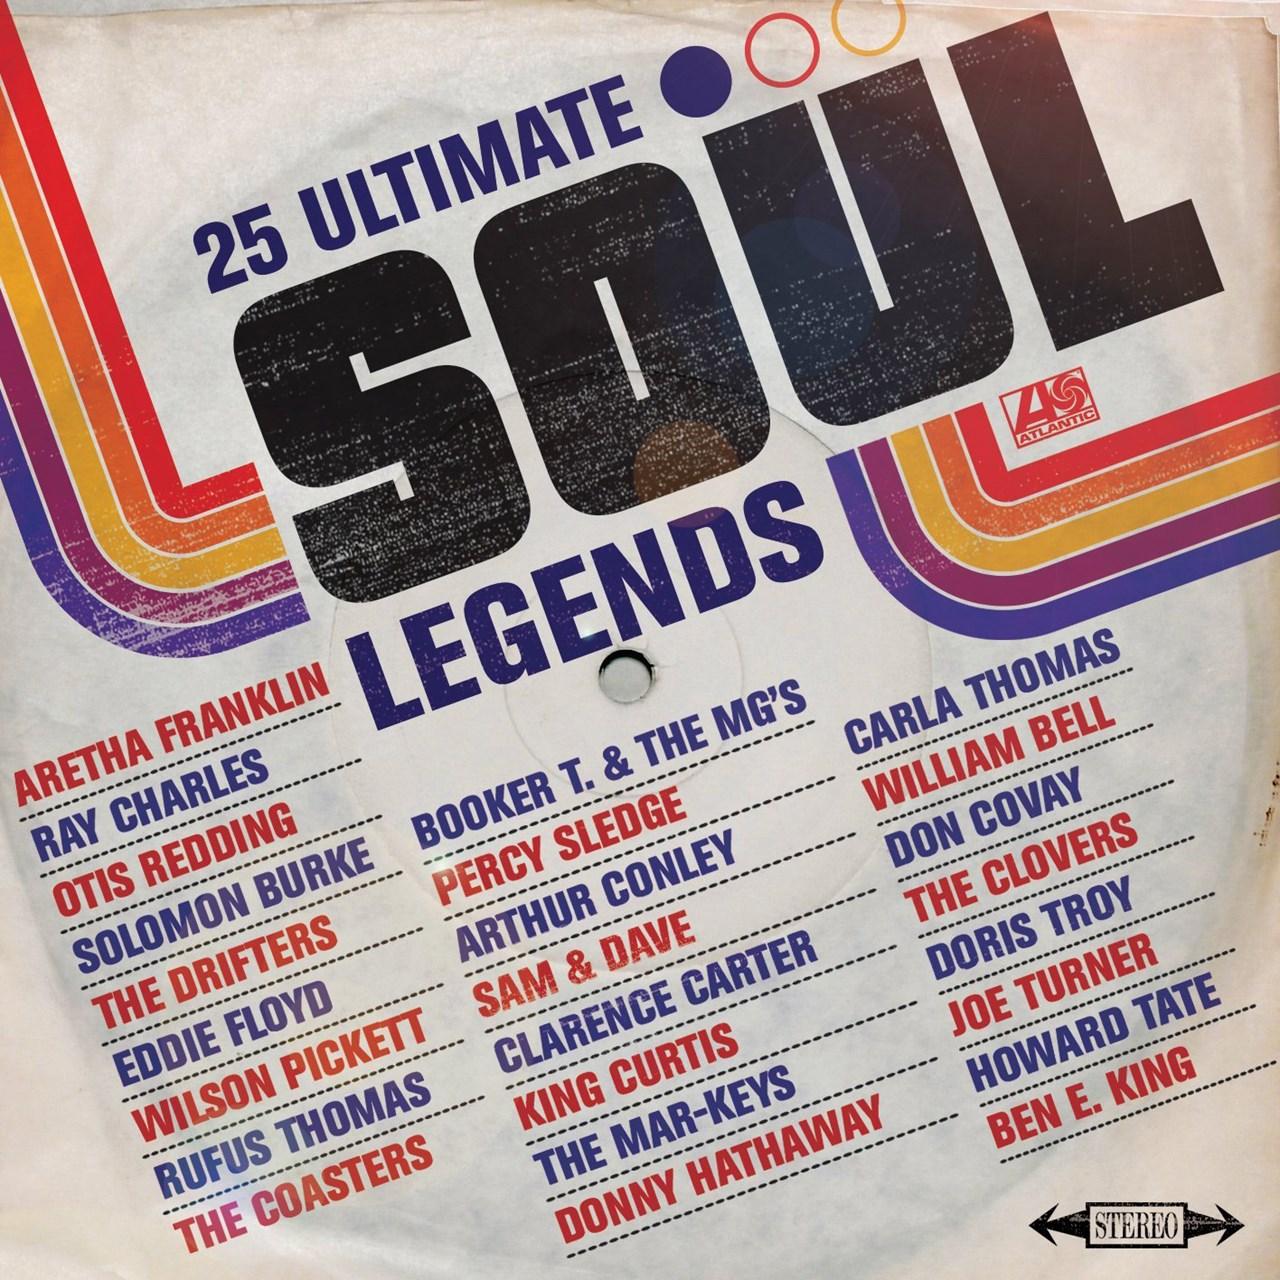 25 Ultimate Soul Legends - 1